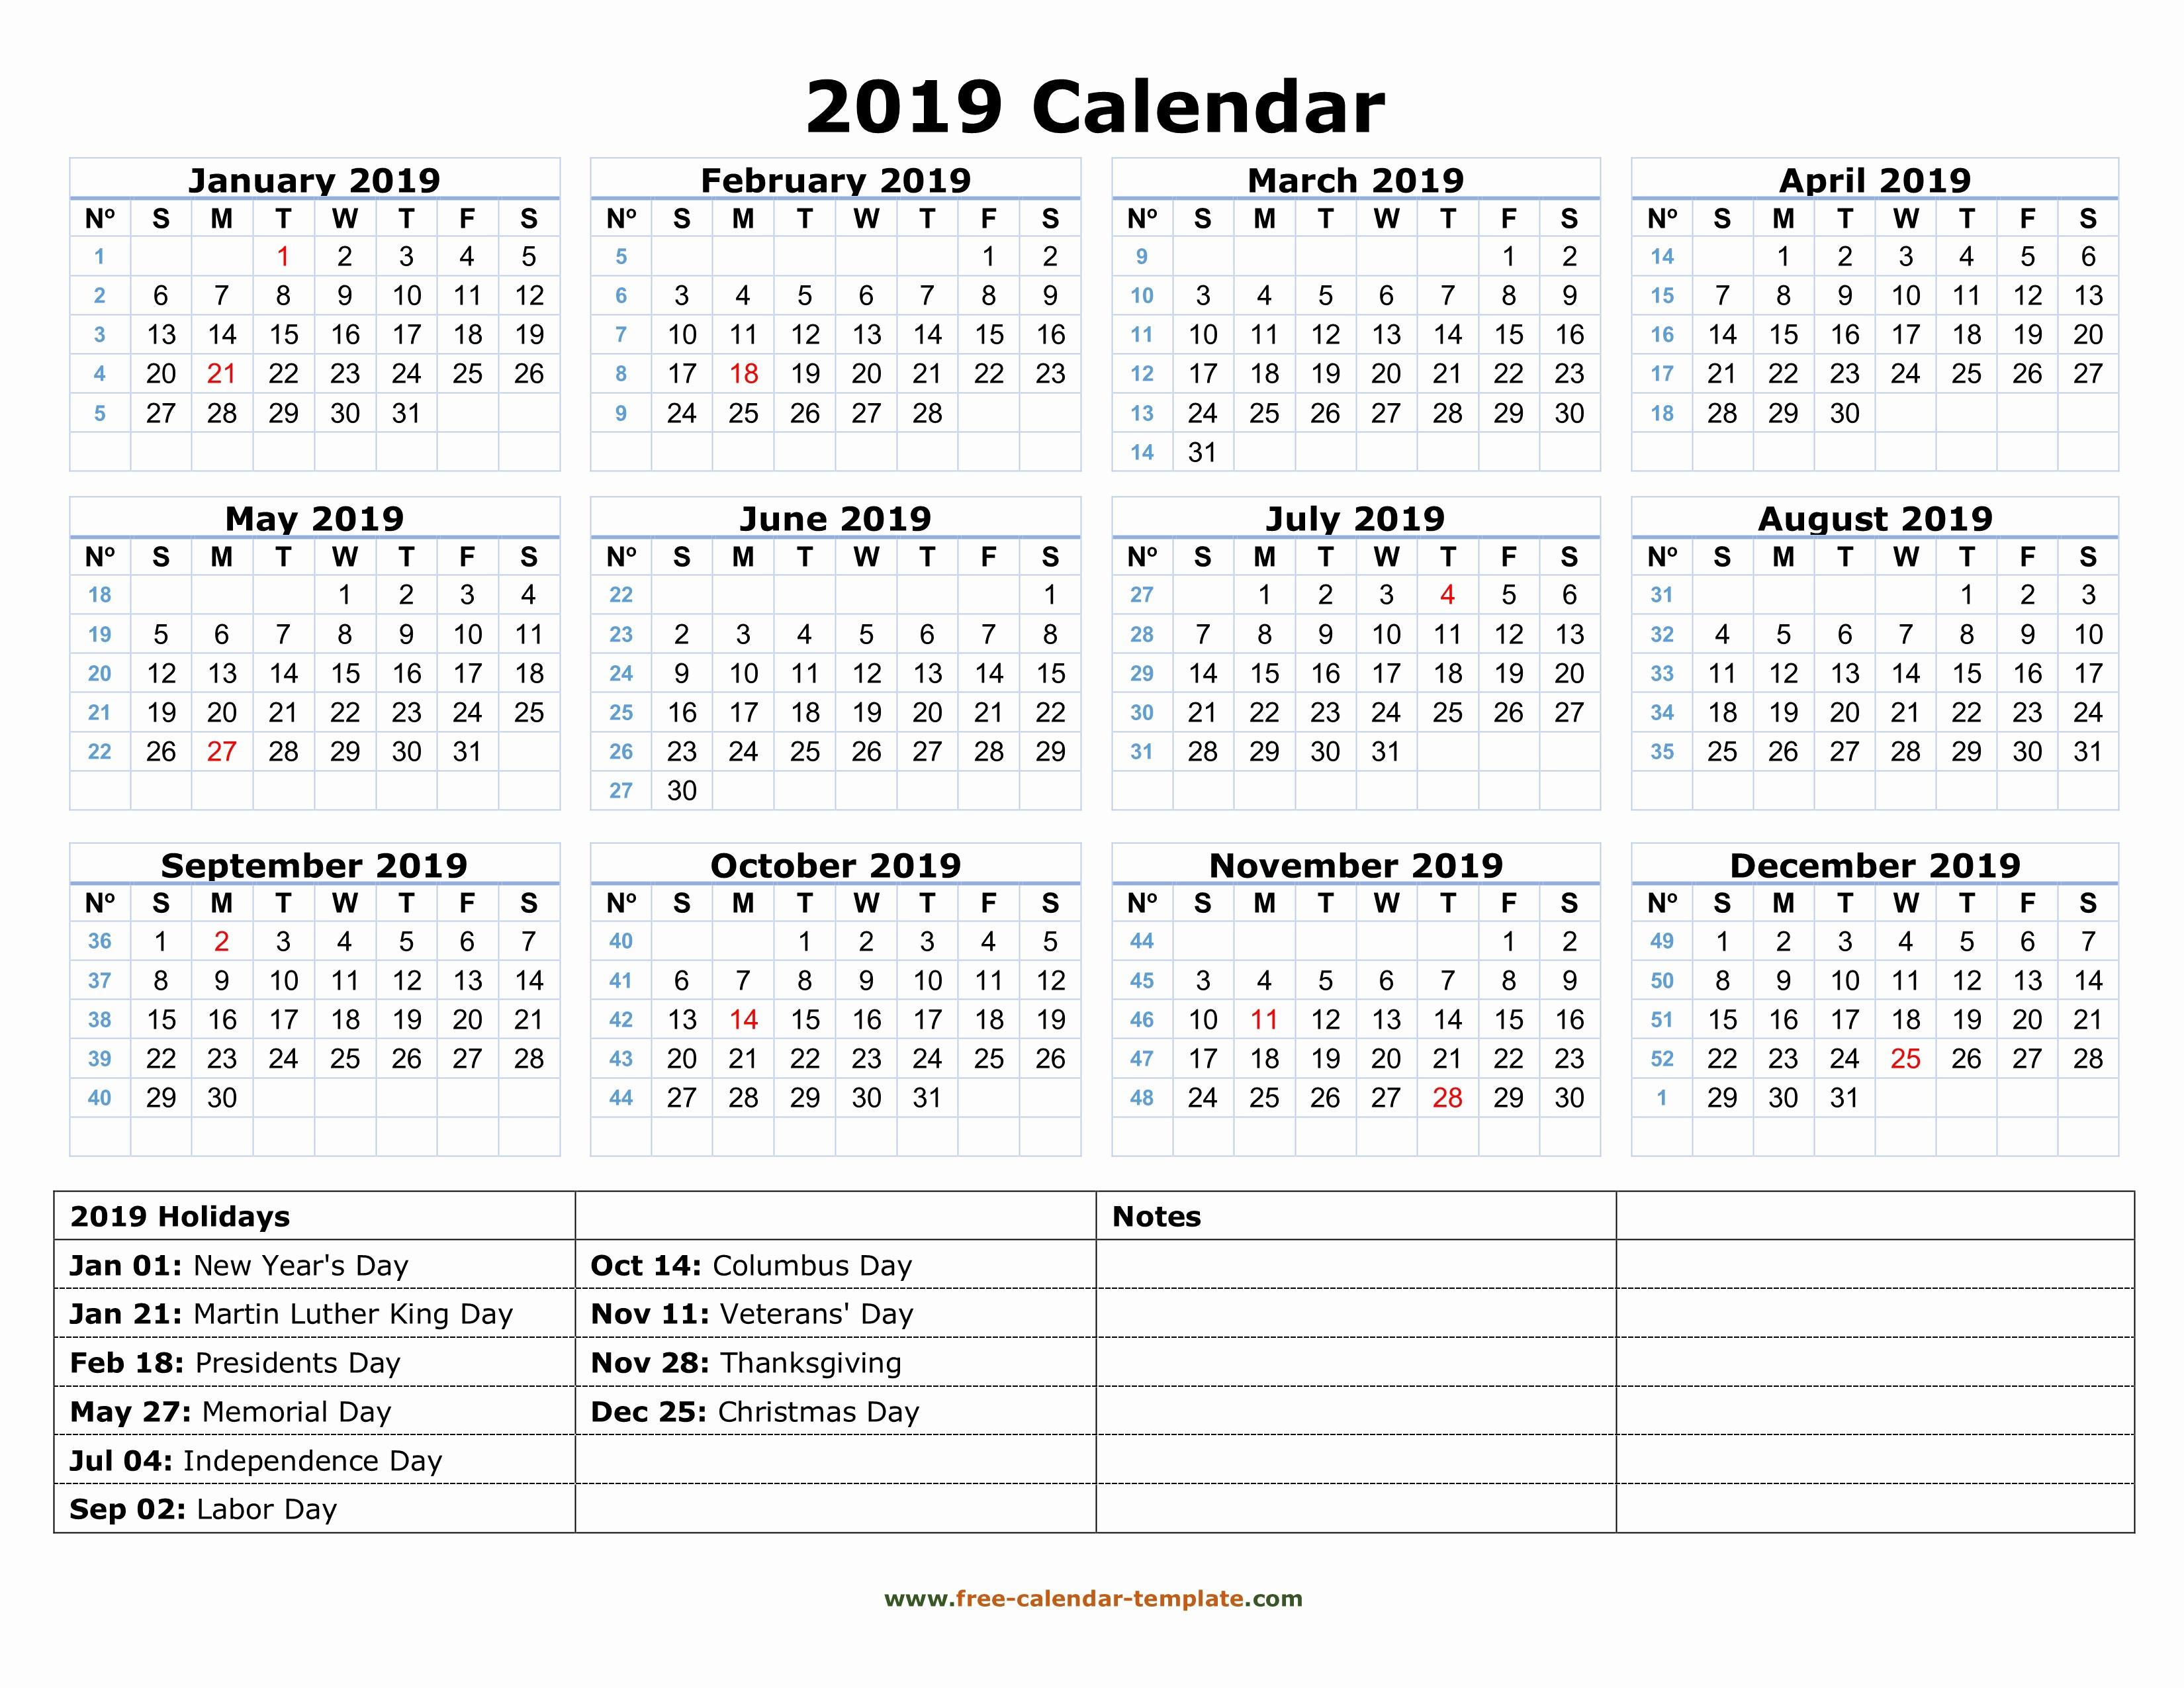 Free Printable Calendar Templates 2019 Elegant Printable Yearly Calendar 2019